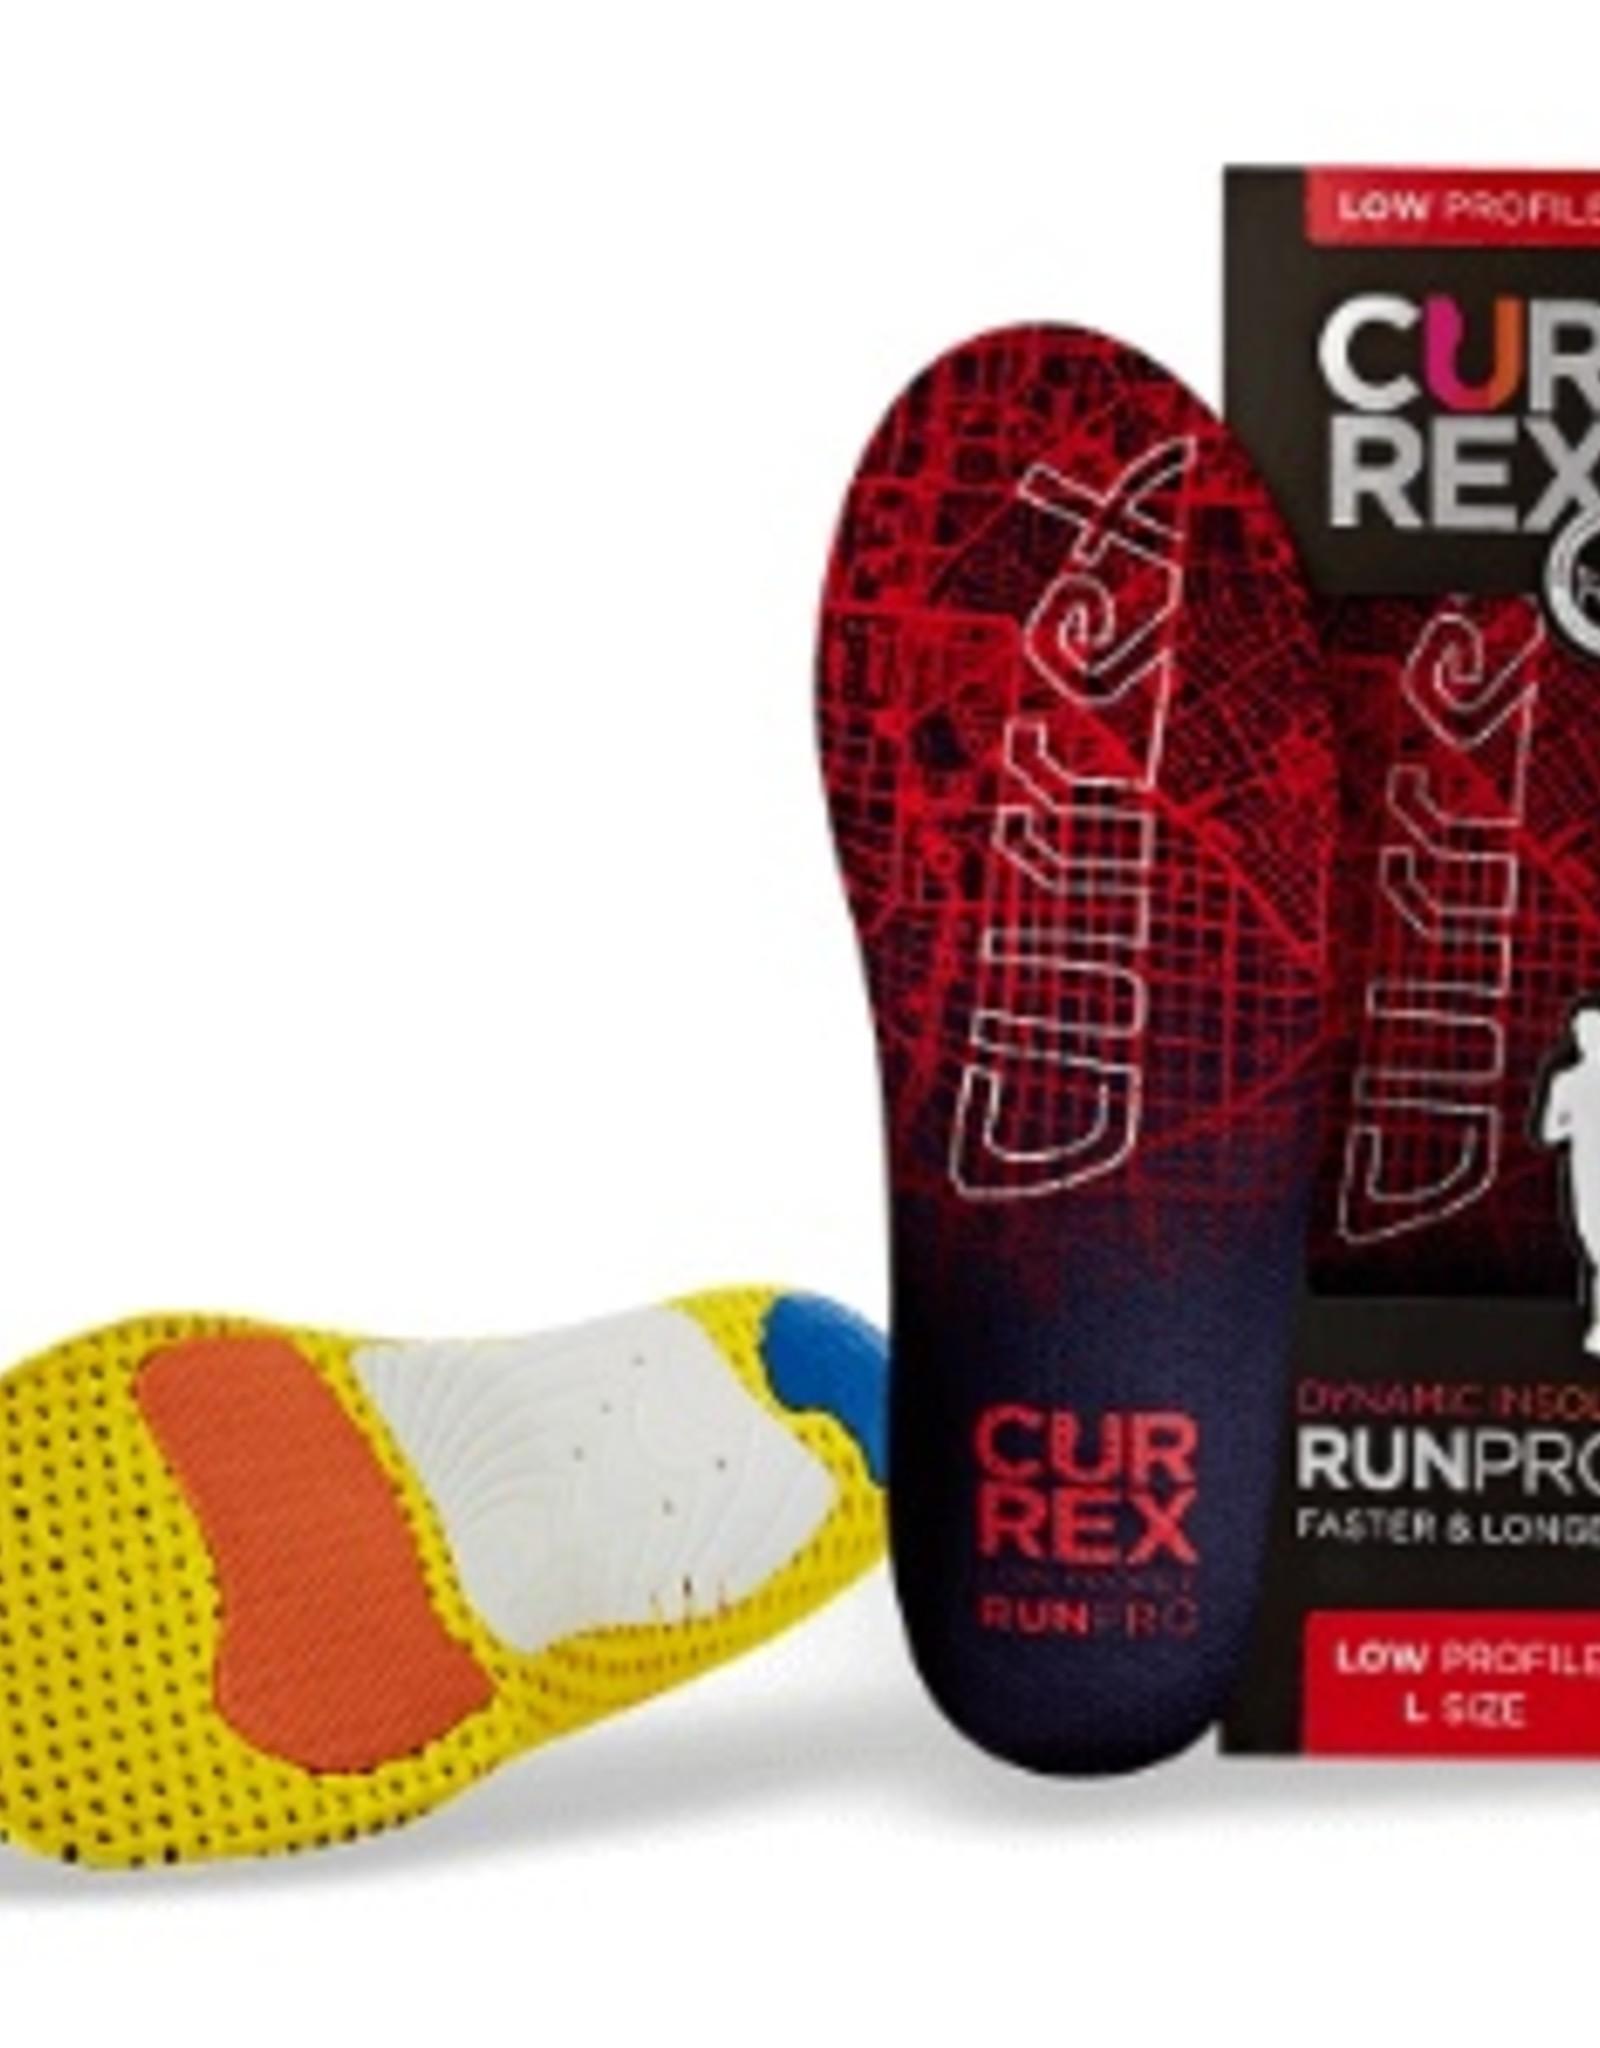 CURREX RUNPRO LOW